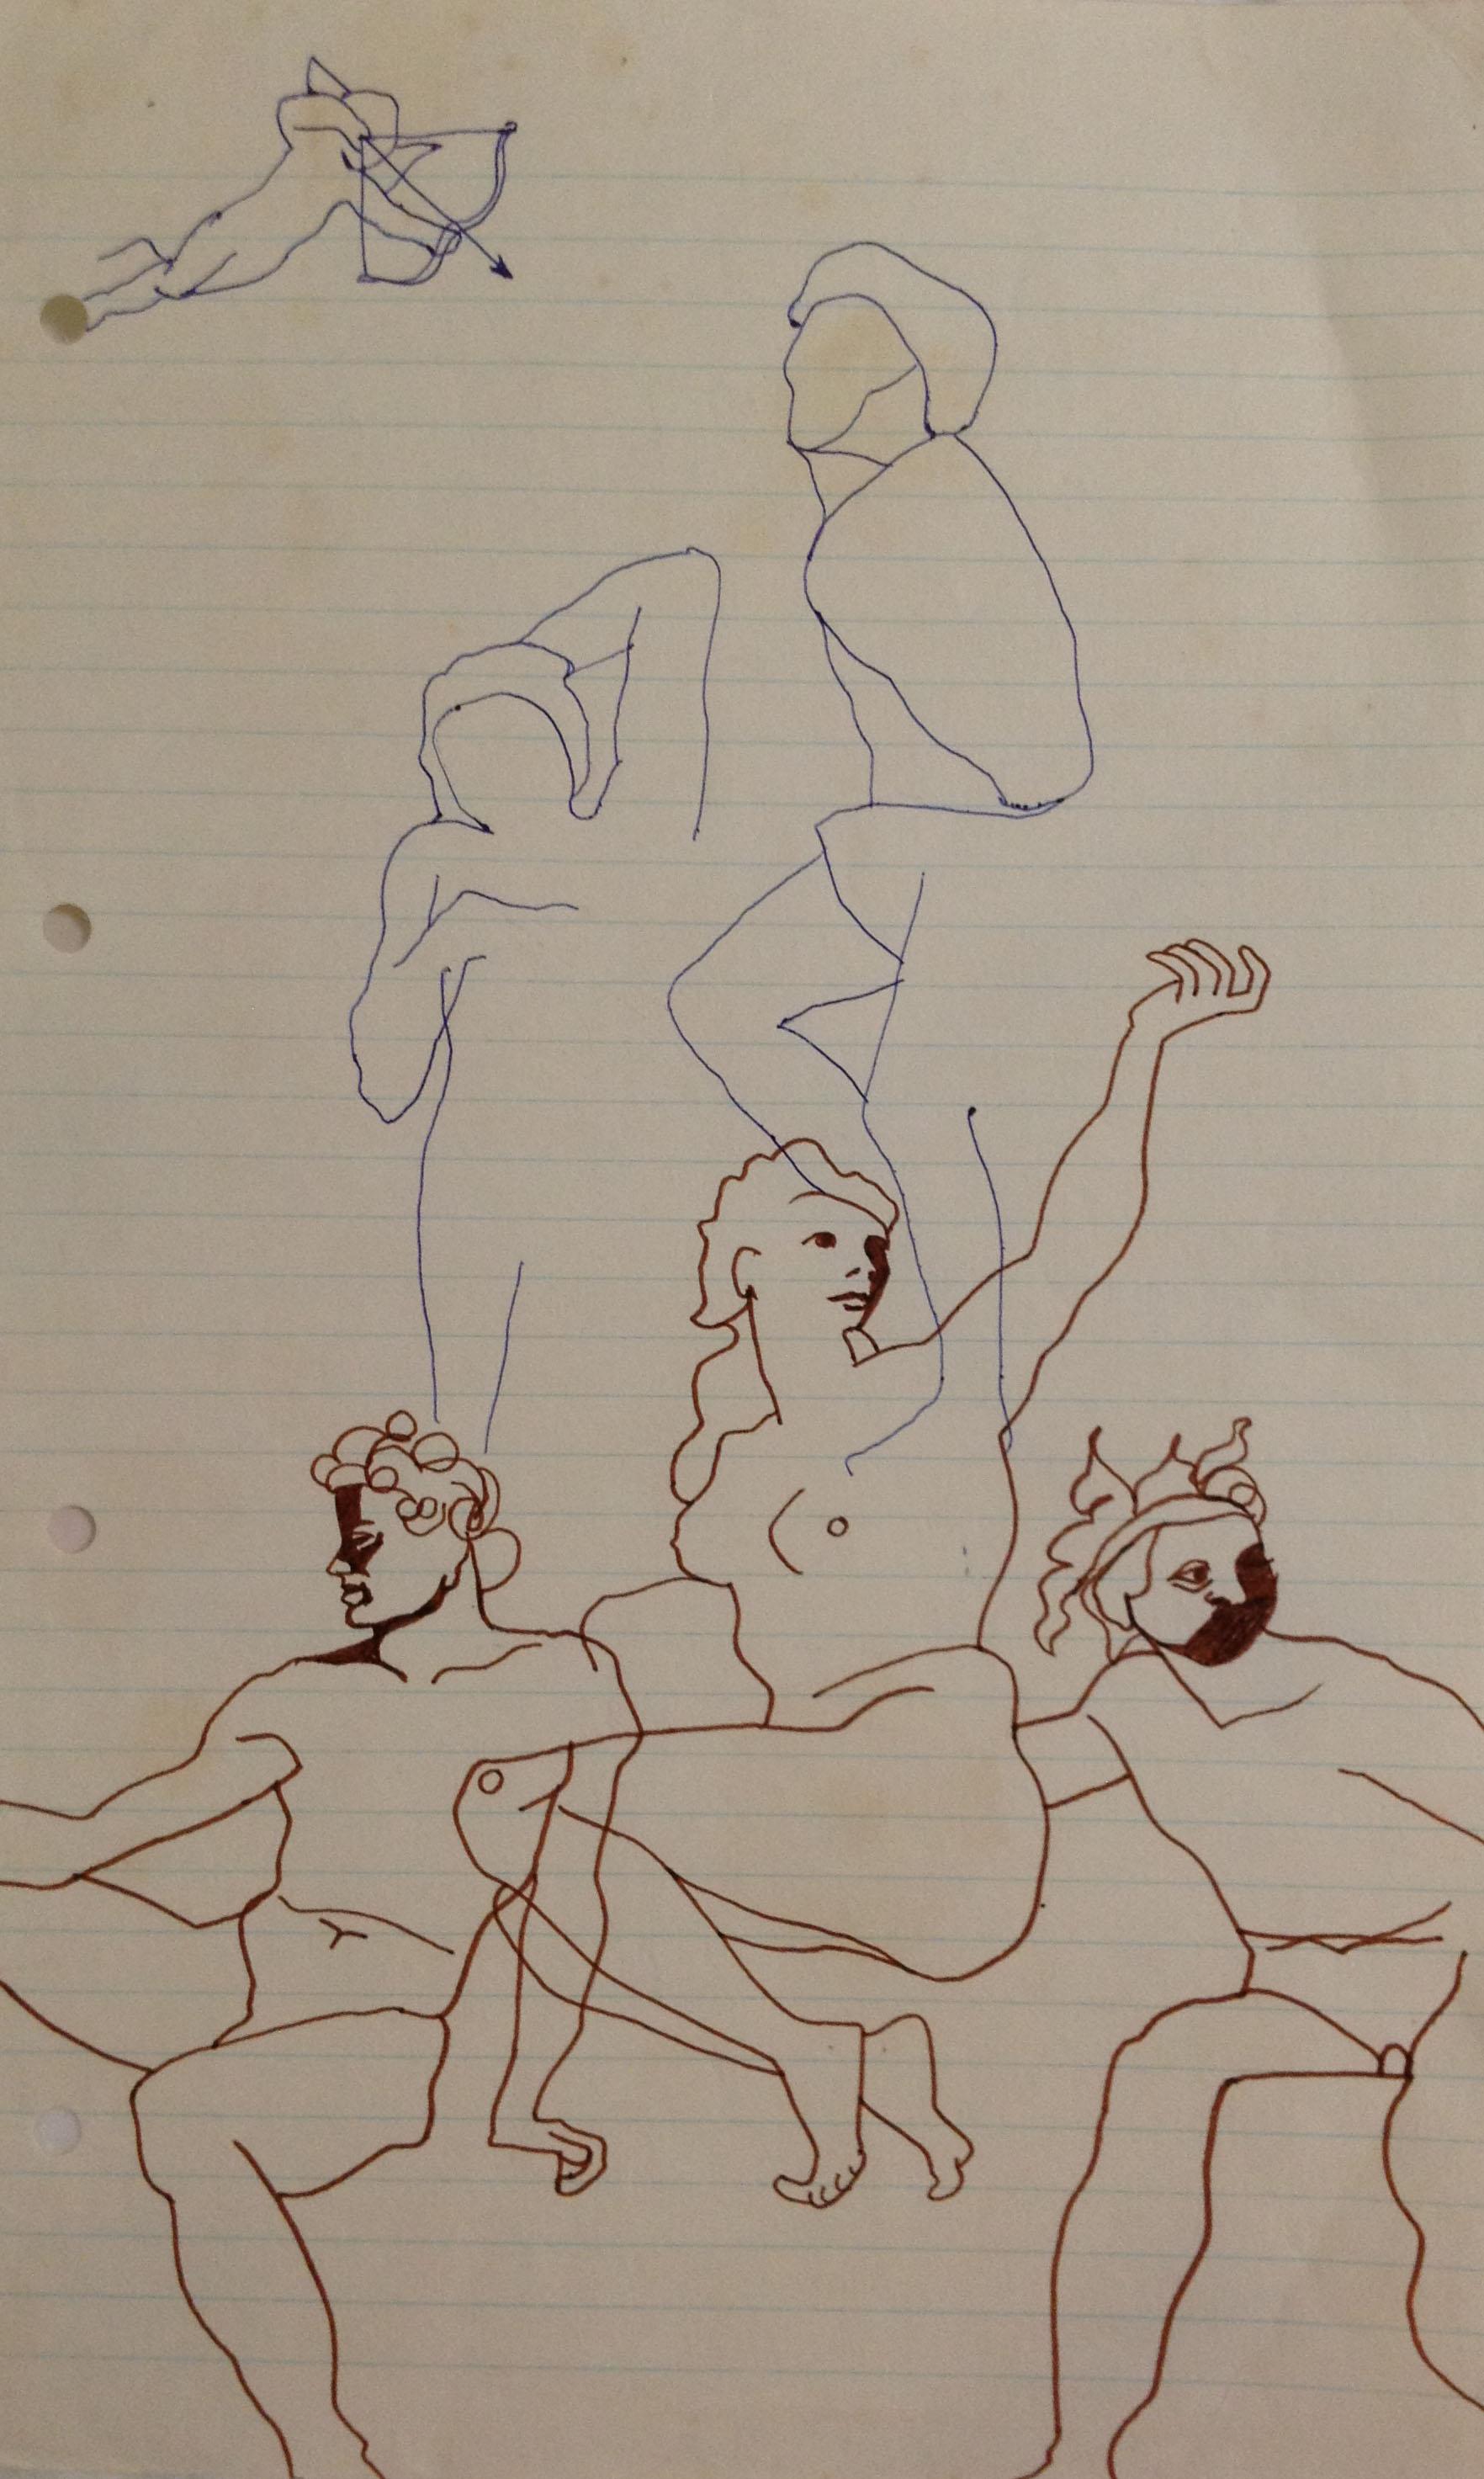 studying art history 4